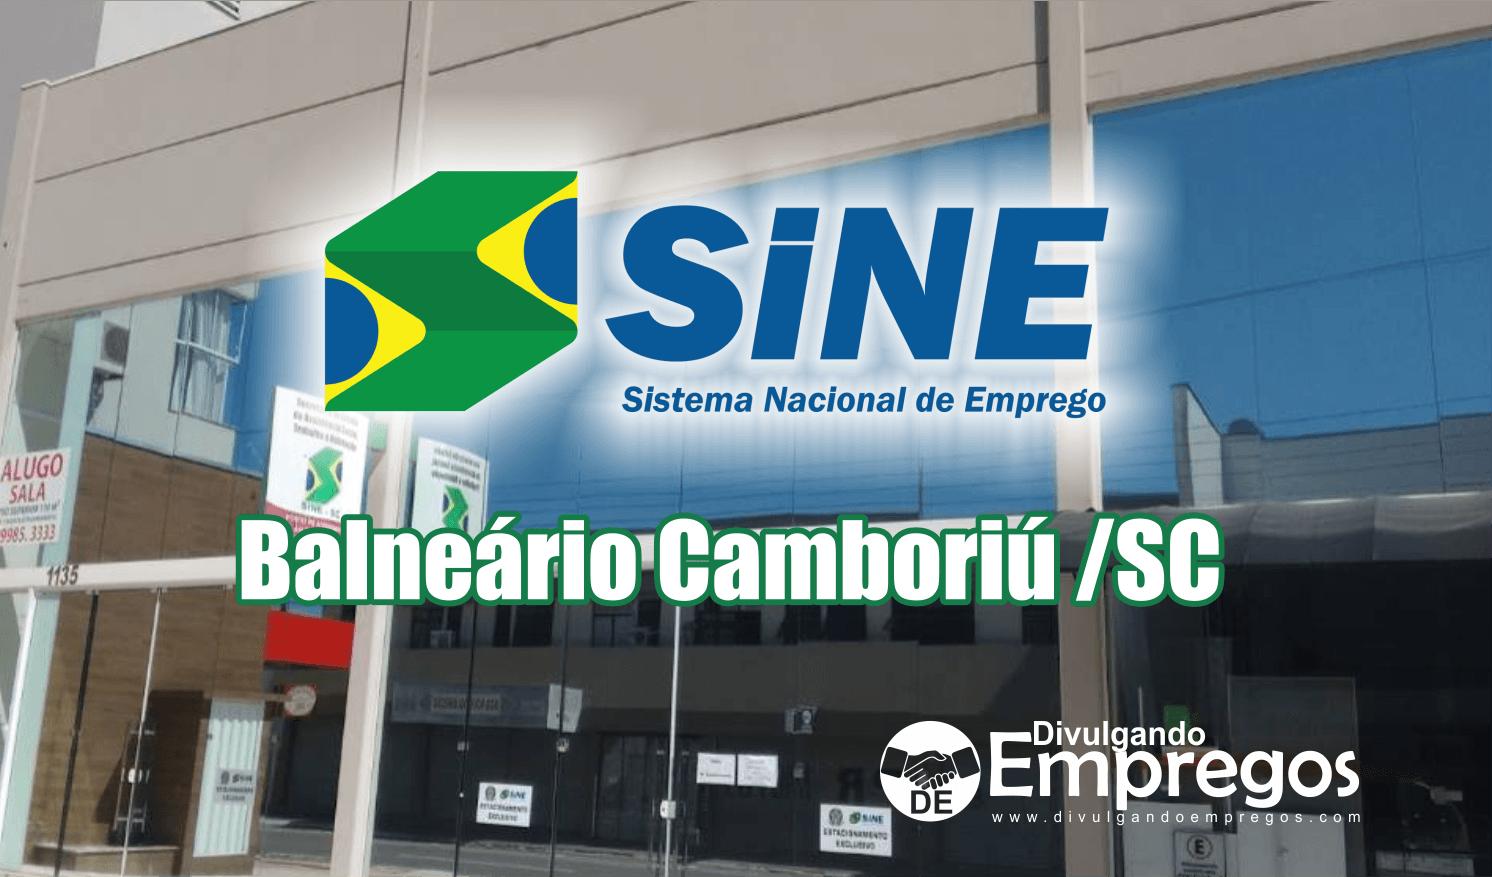 Sine Balneário Camboriú